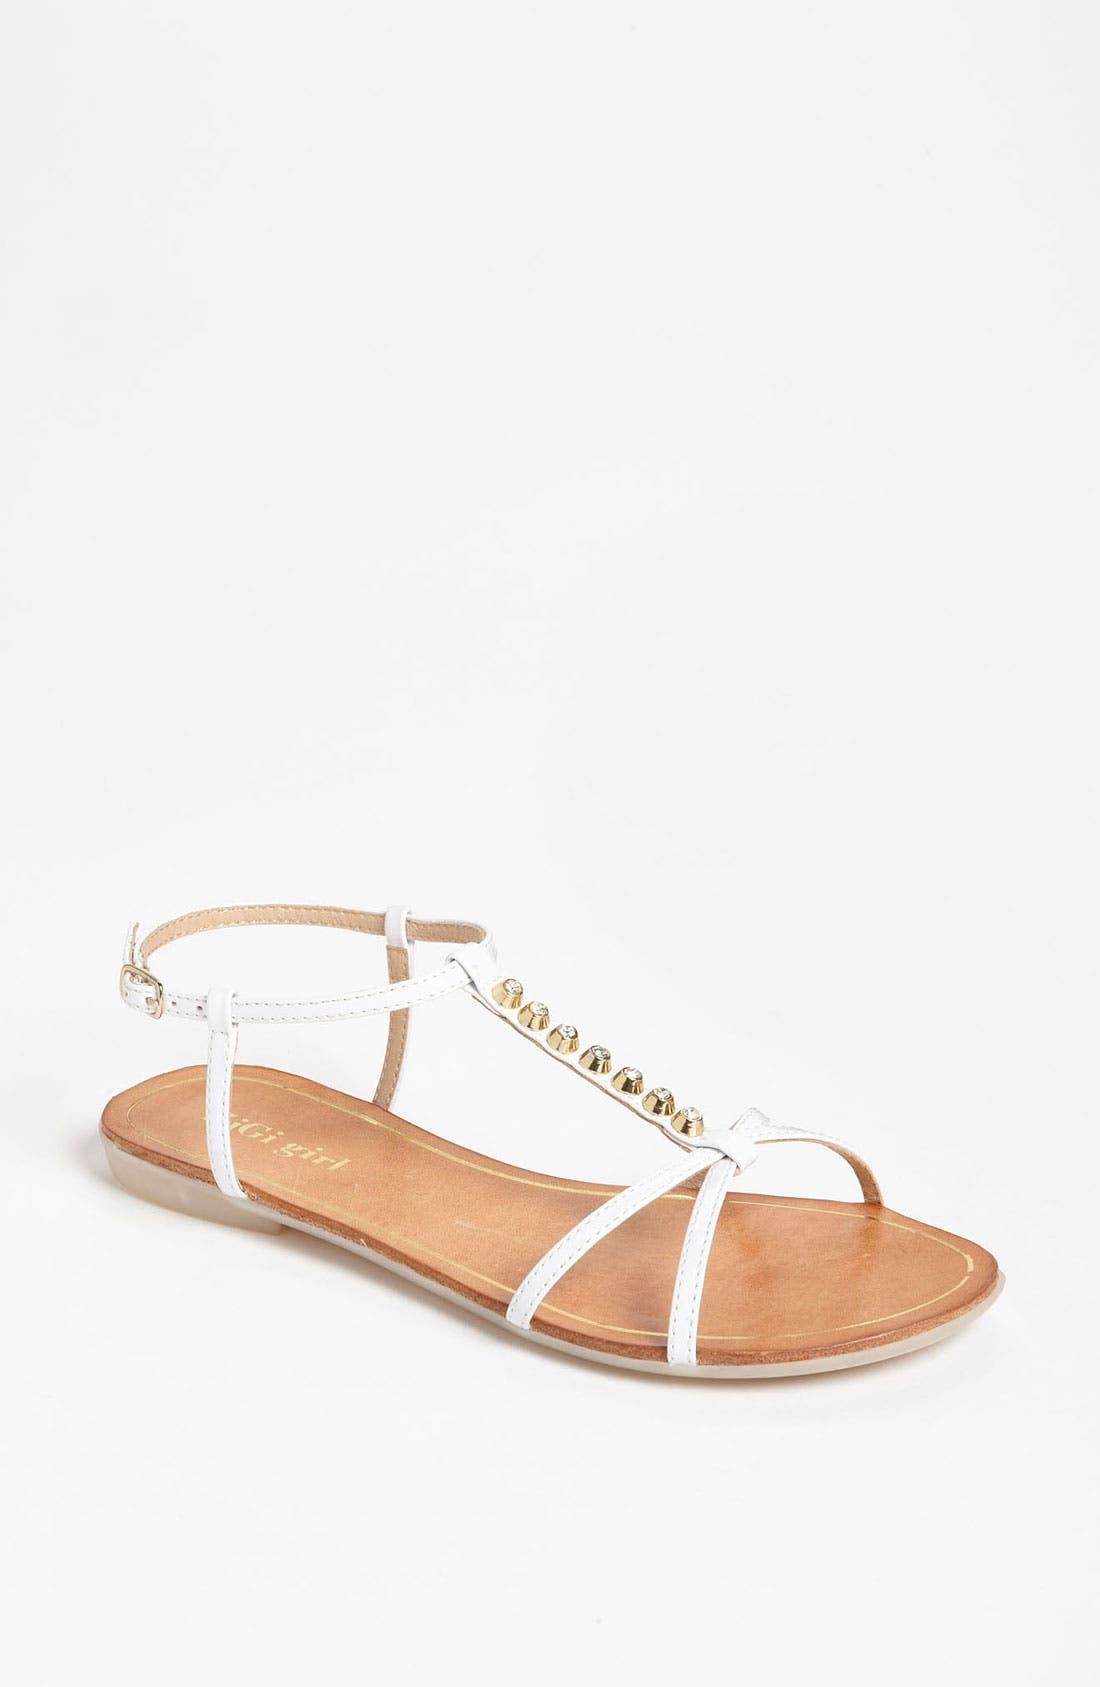 Main Image - ZiGi girl 'Adorable' Sandal